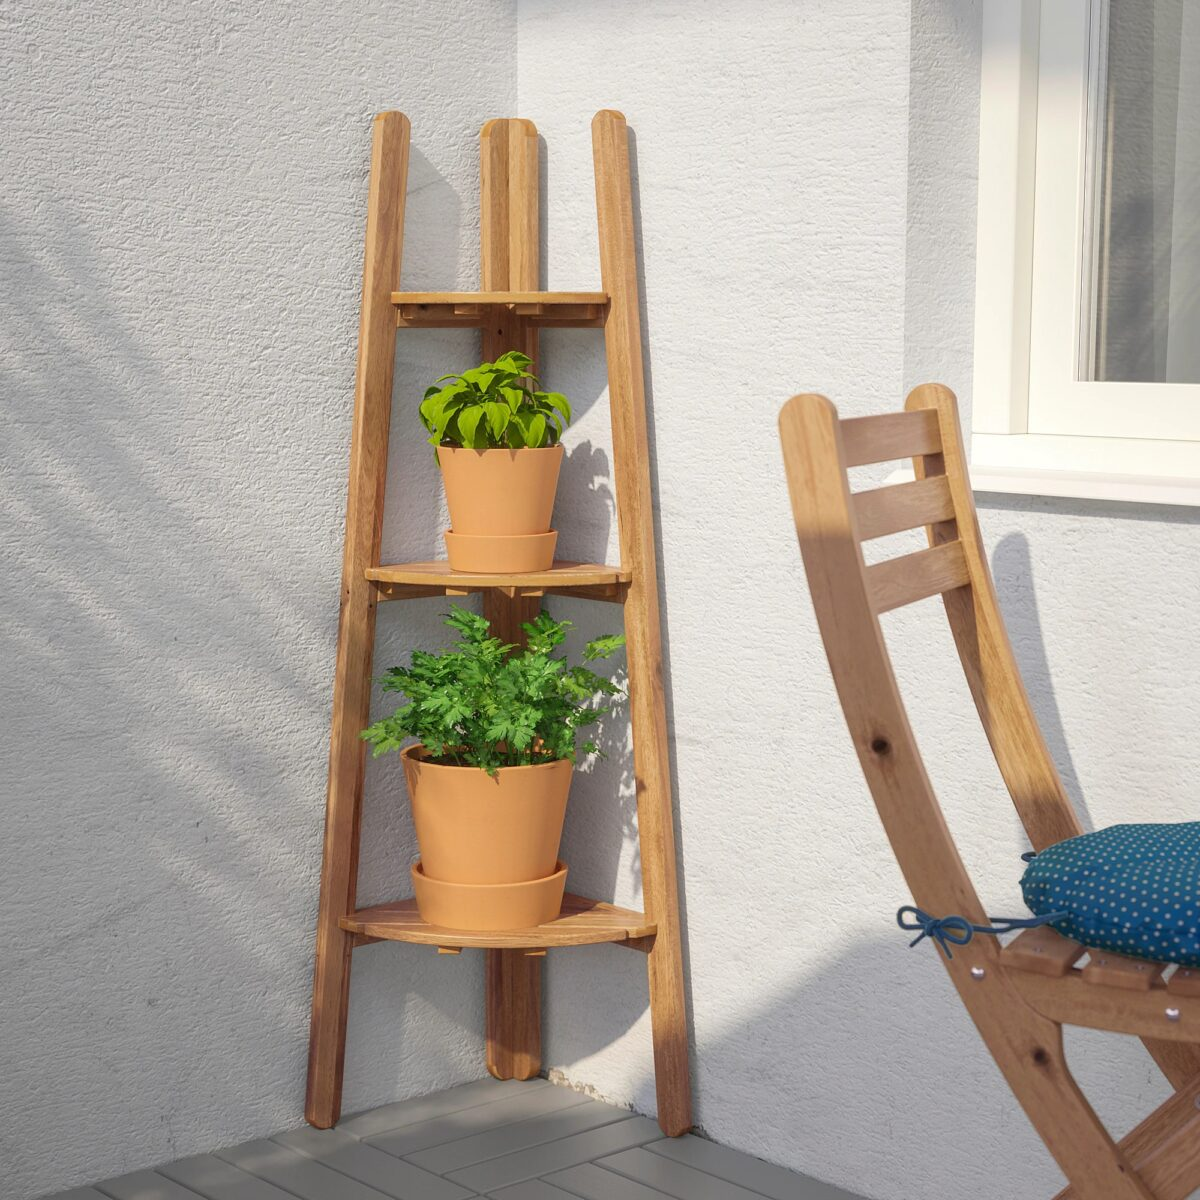 ikea-askholmen-piedistallo-per-piante-mordente-marrone-chiaro